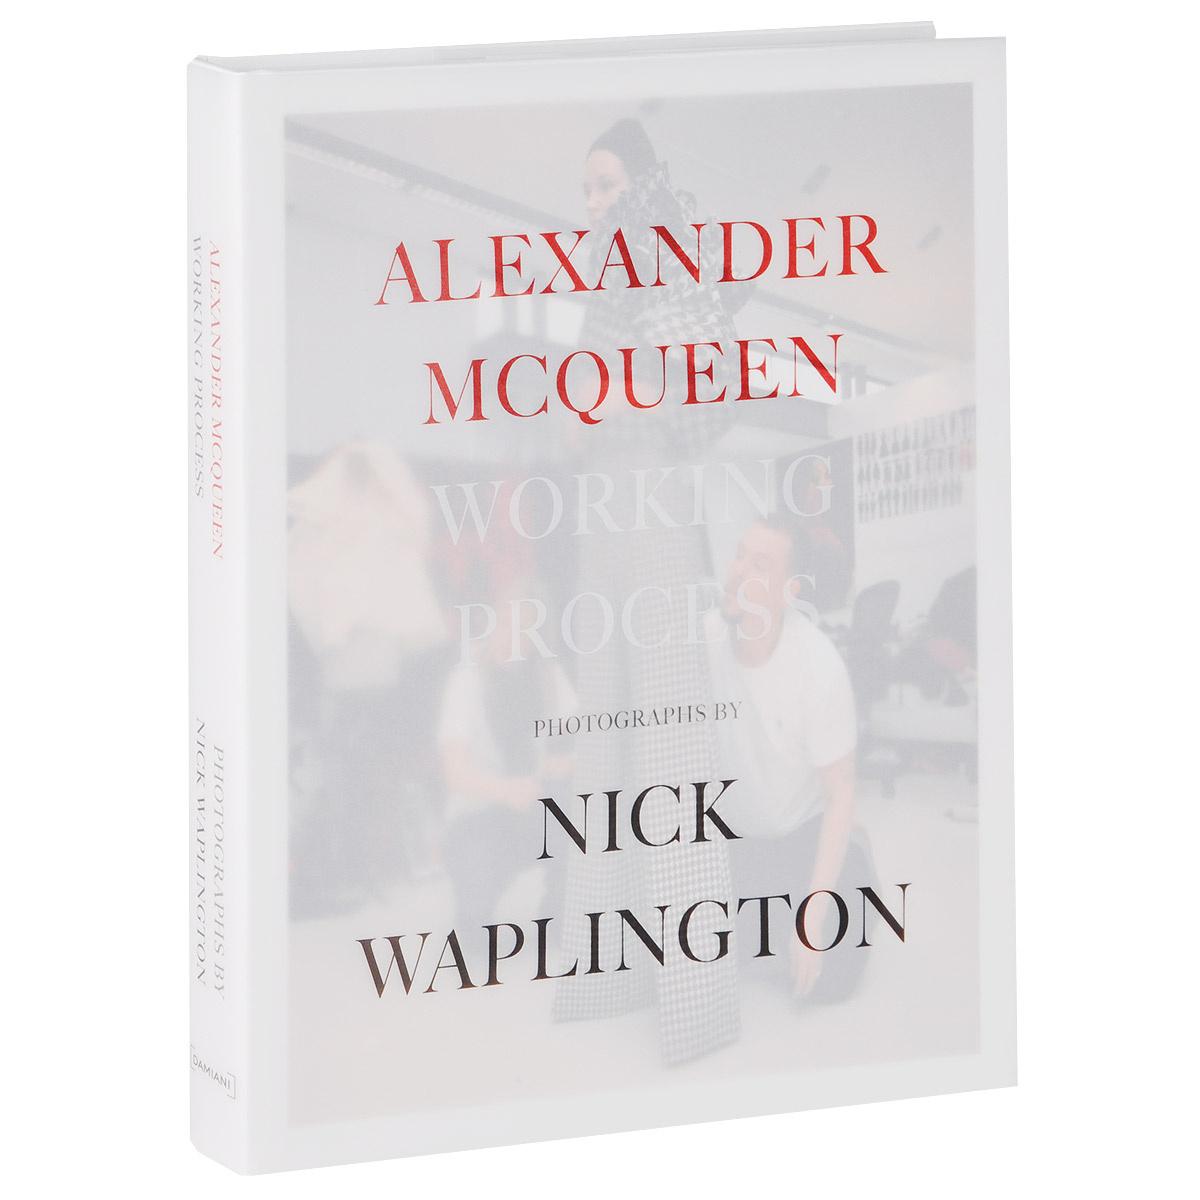 Alexander McQueen: Working Process | Frankel Susannah #1